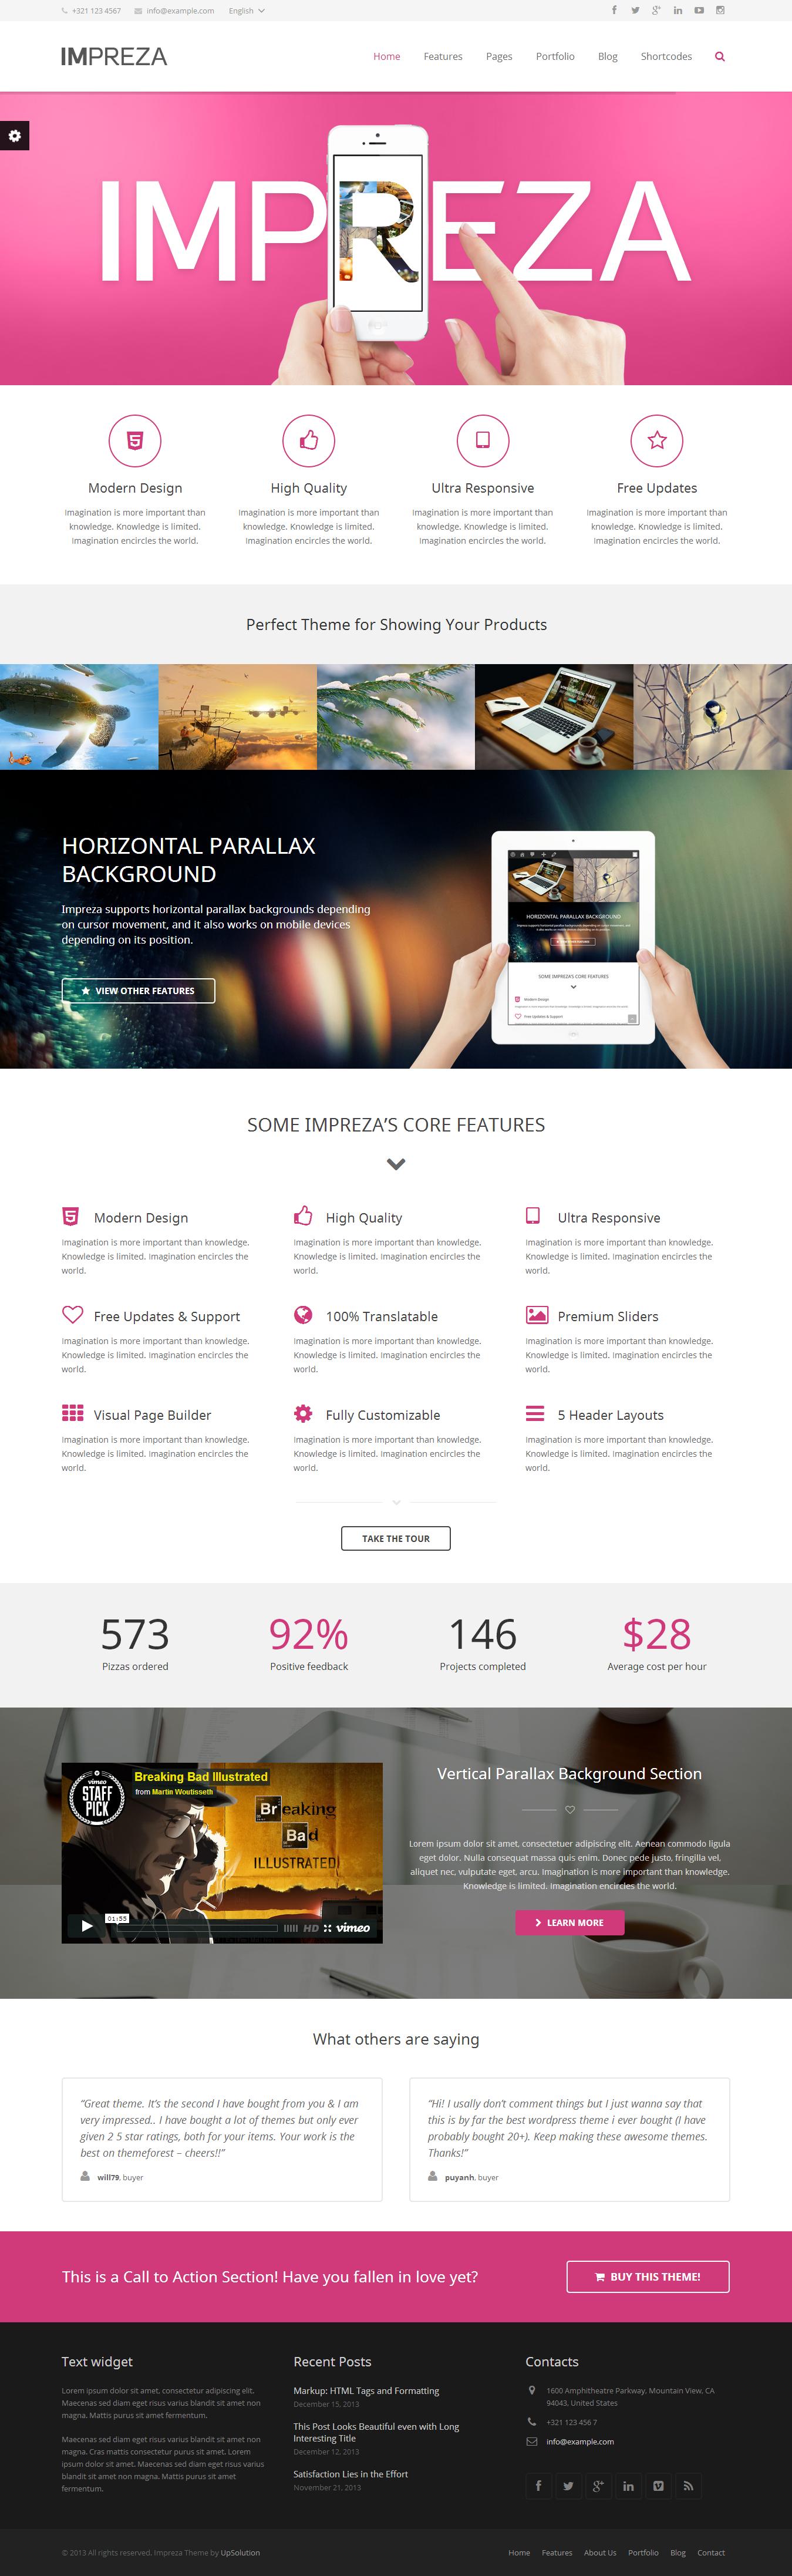 Impreza - Retina Responsive WordPress Theme themeforest.net/... #web #design #wo...